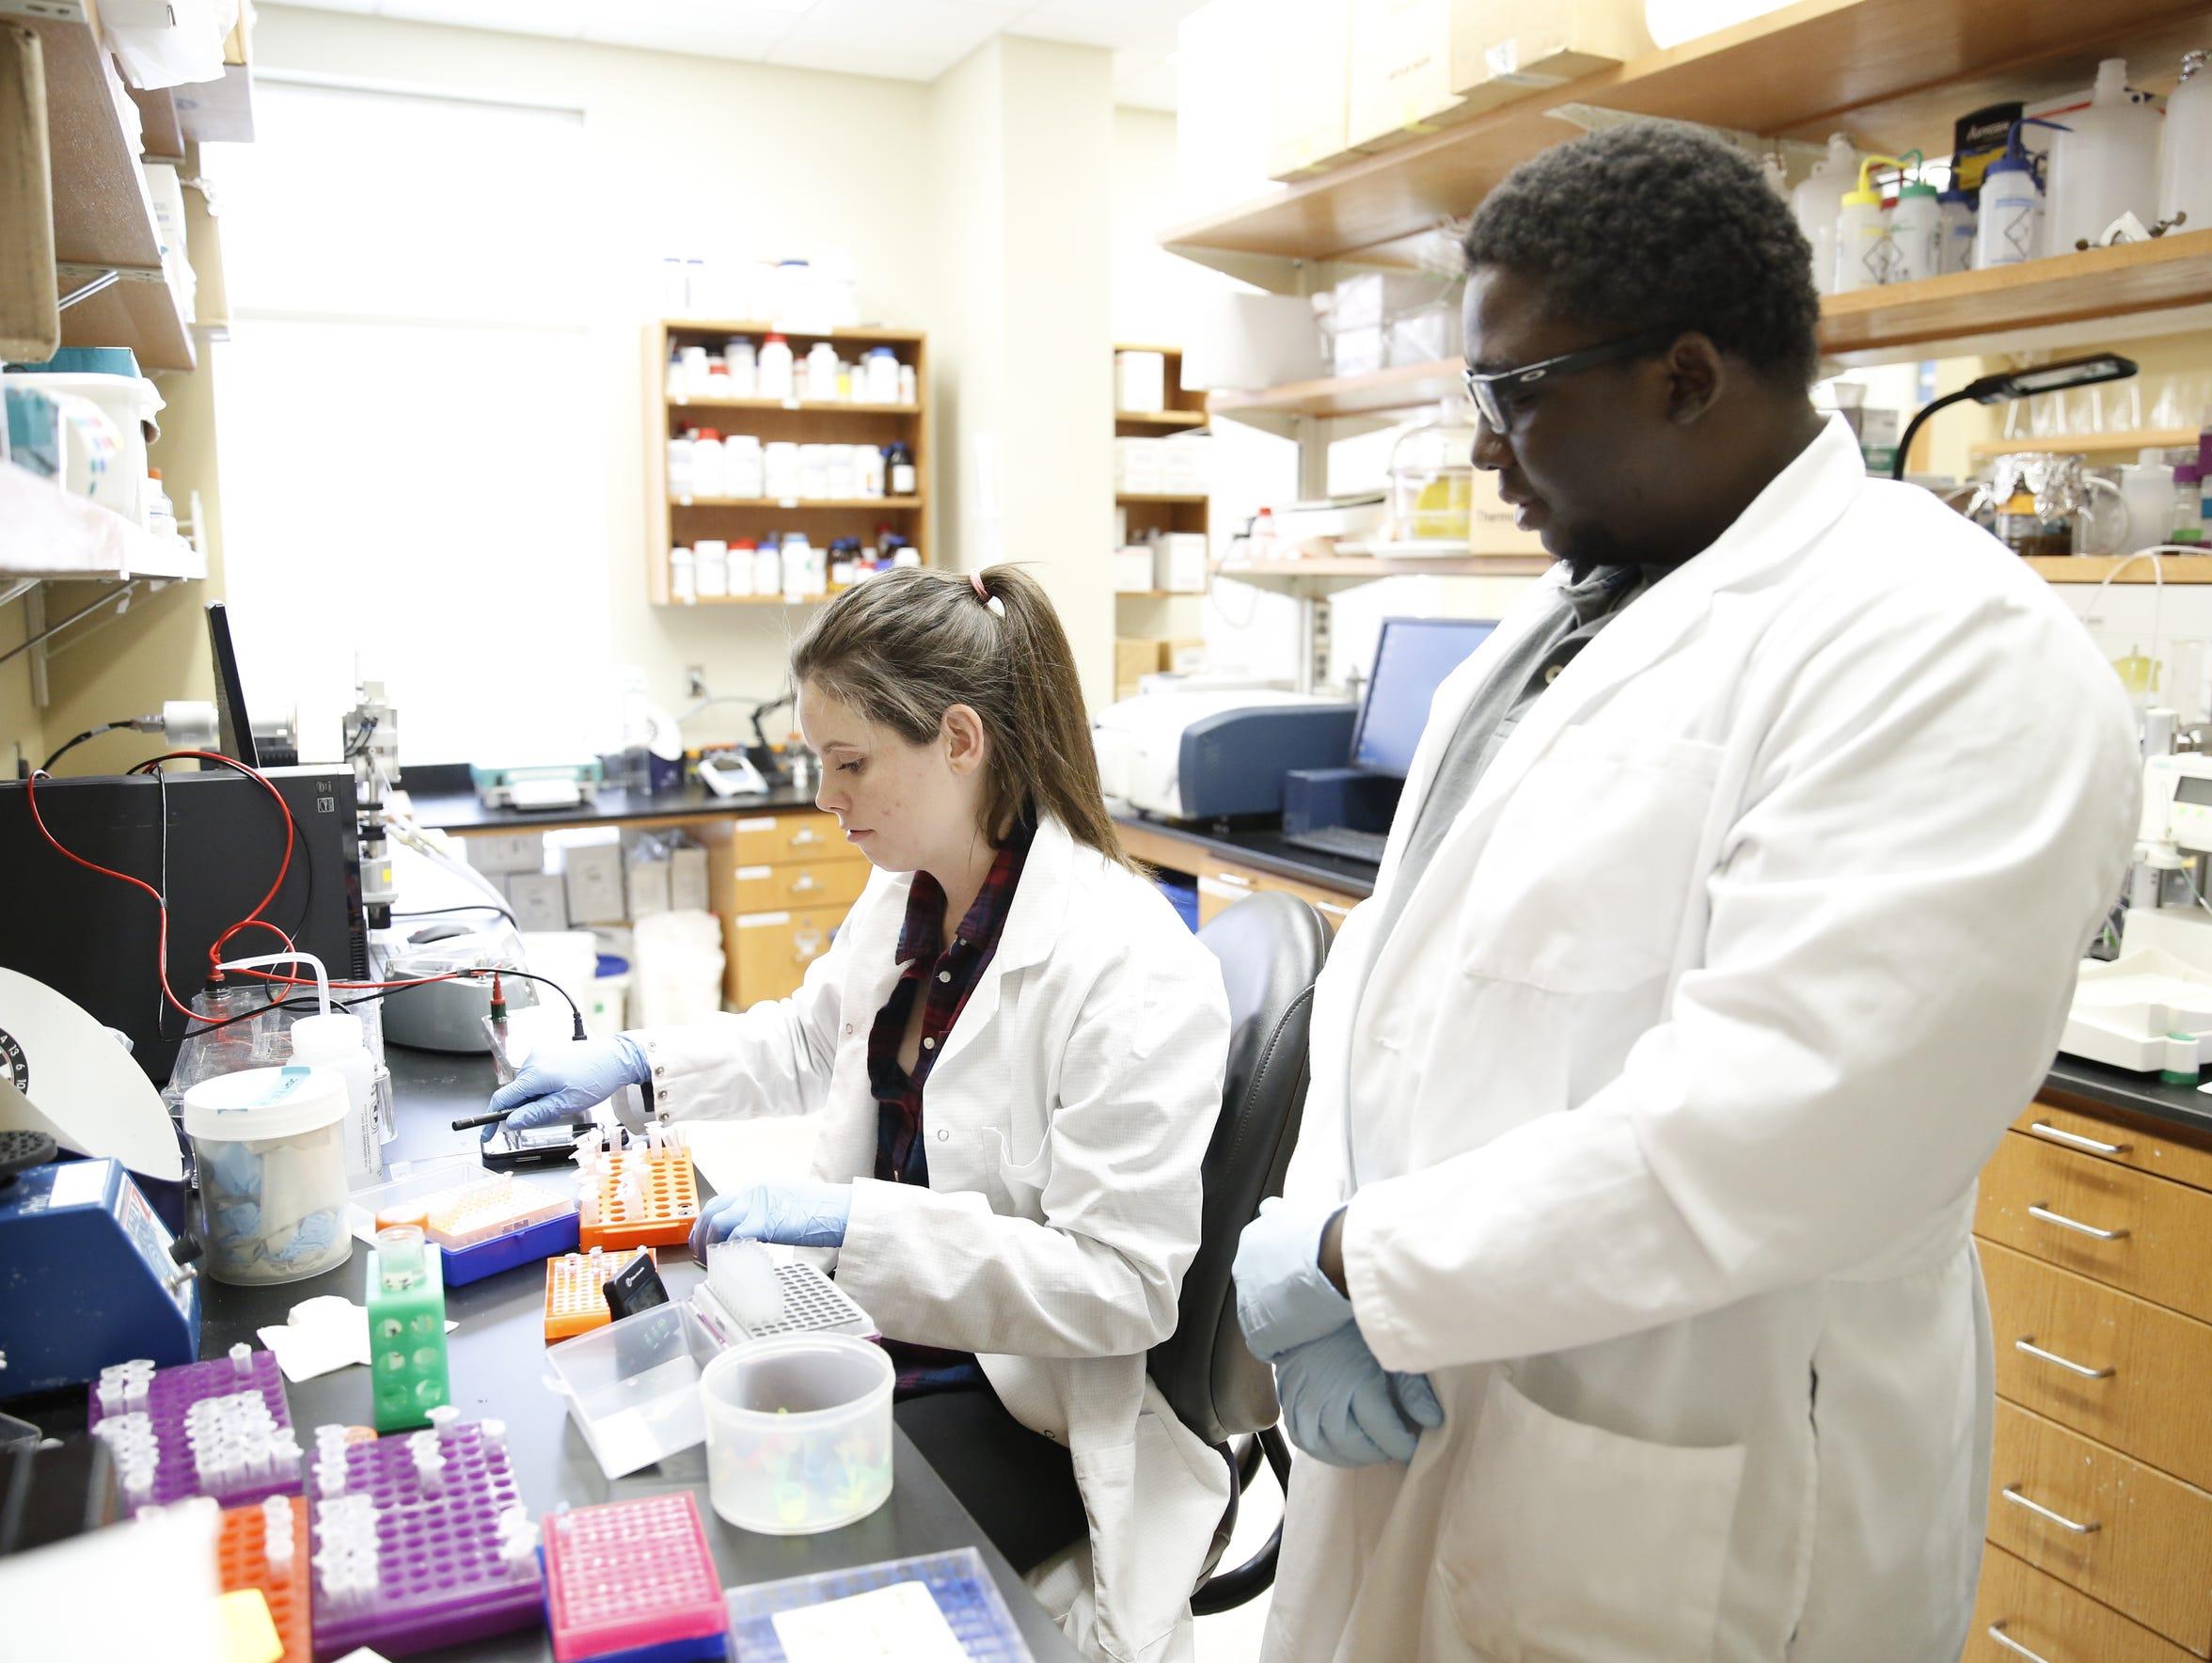 Junior biology major Joslyn Schipper, left, and research